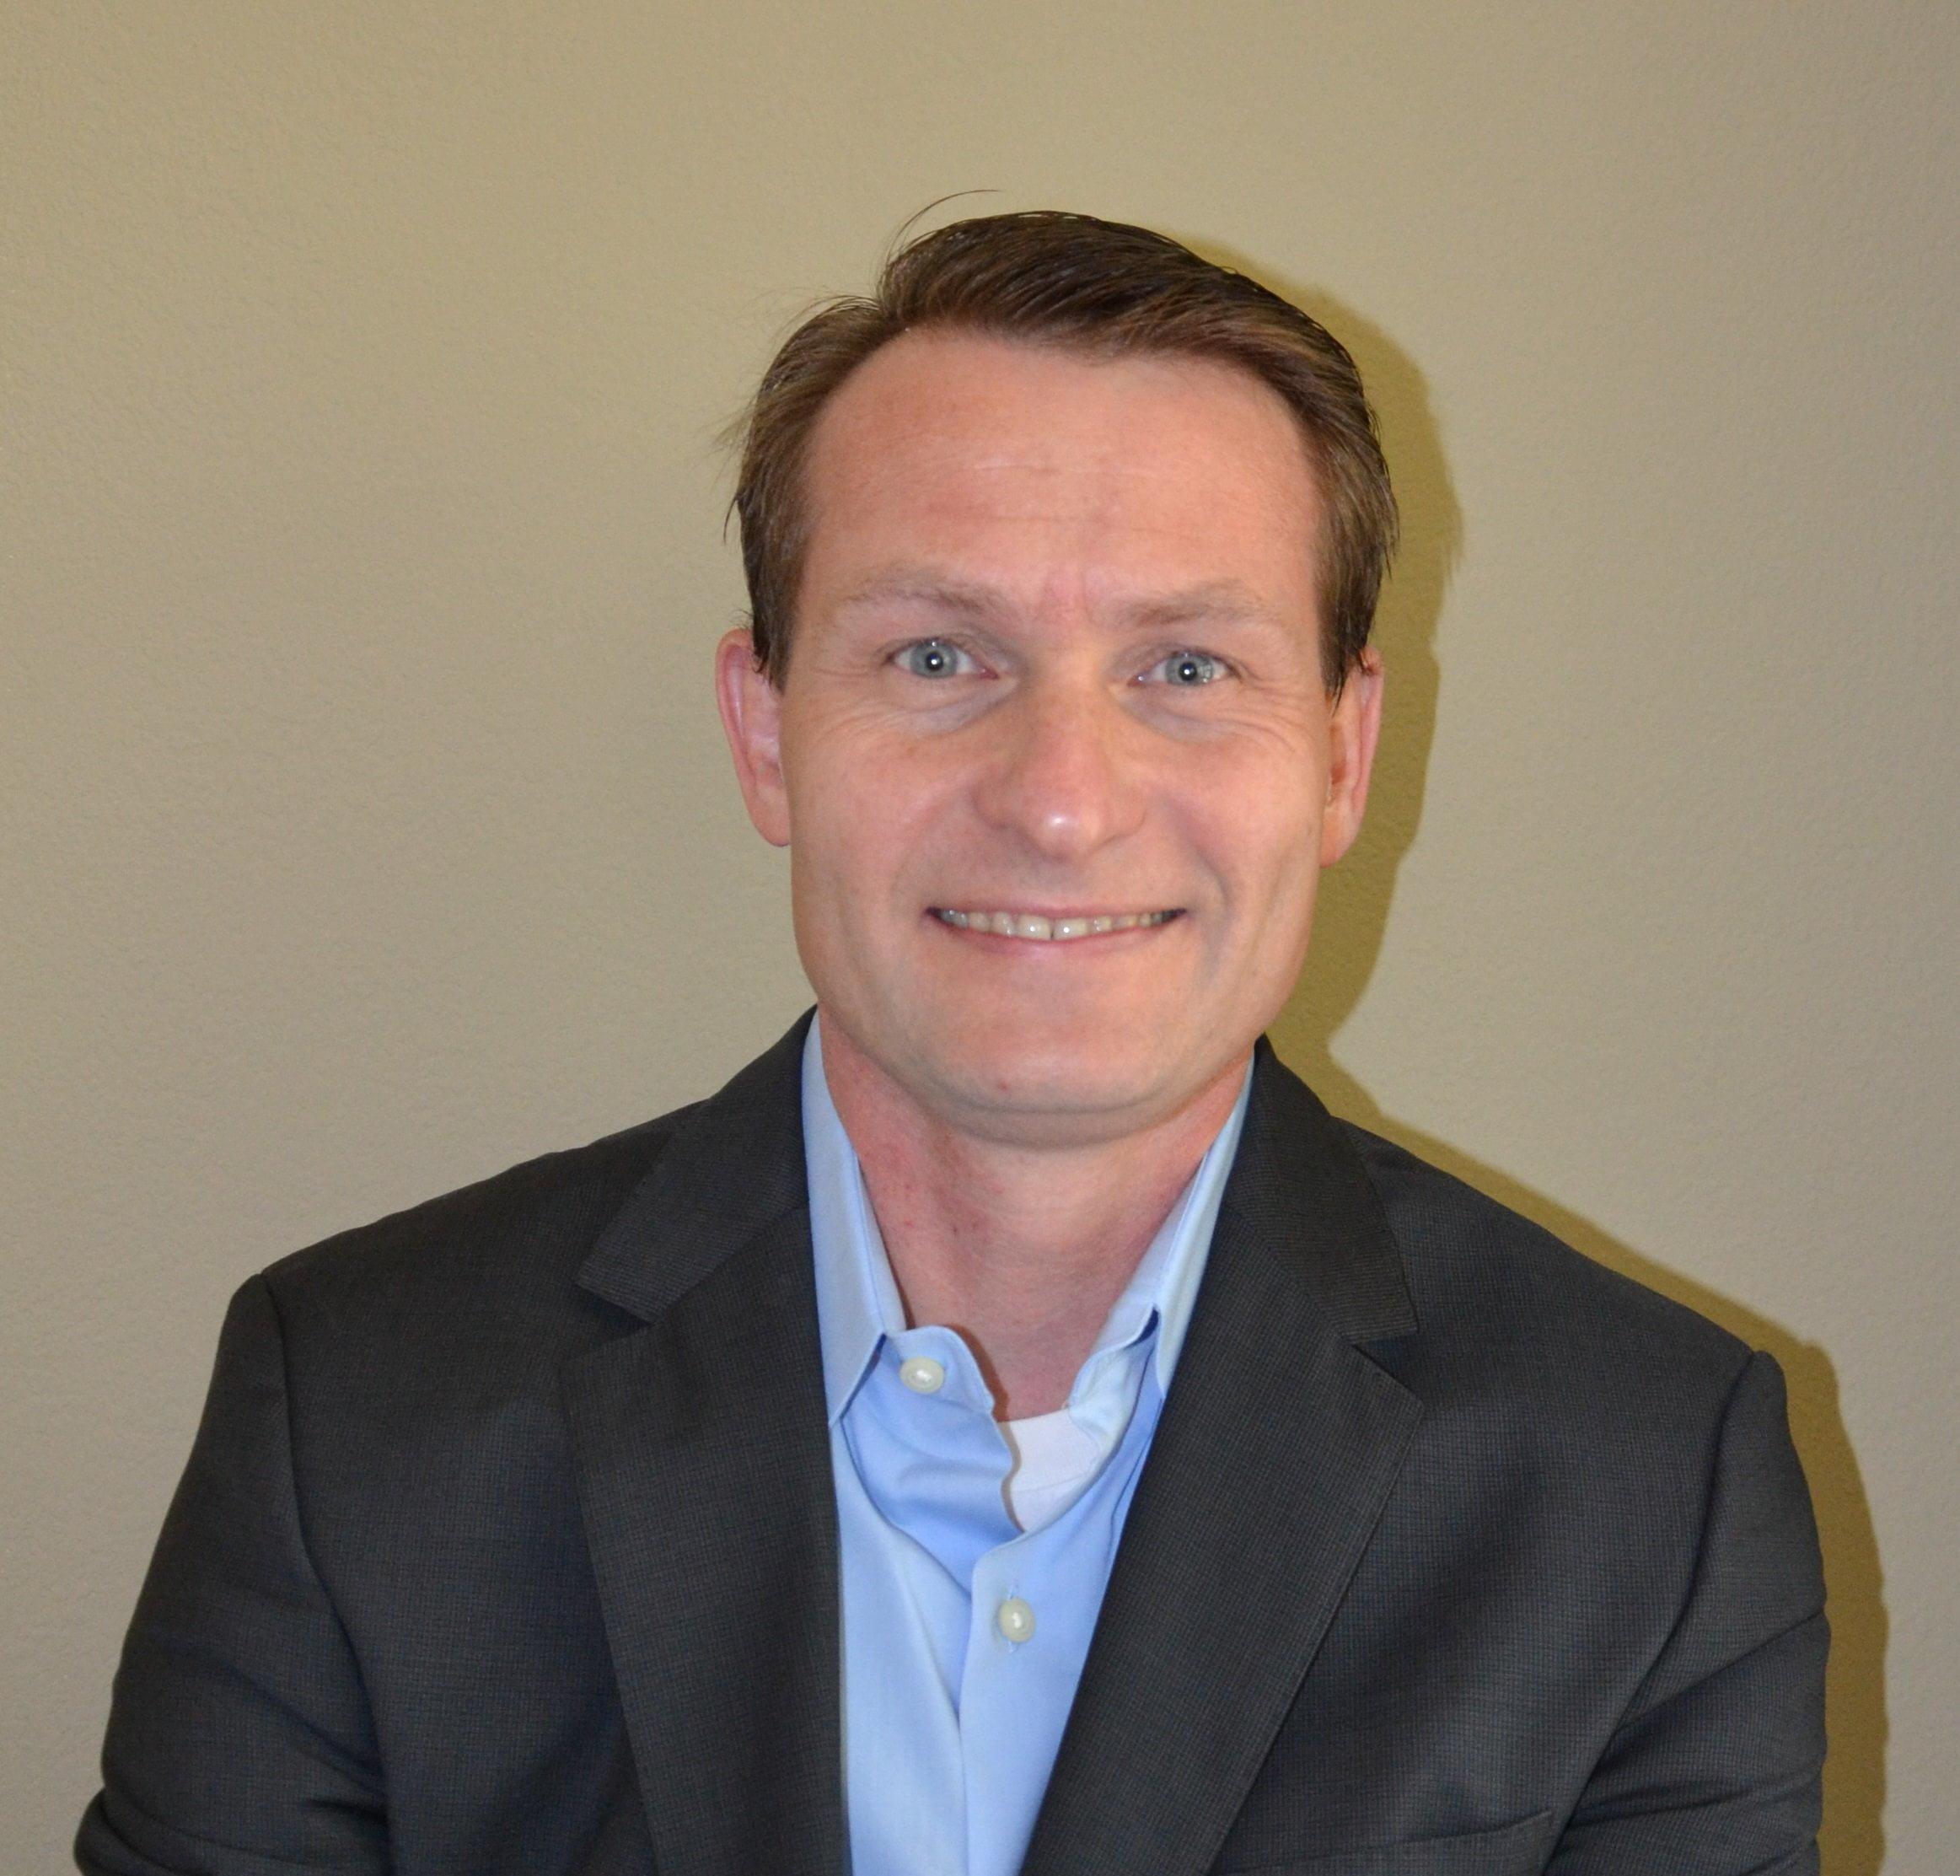 Scott W Johnson, johtaja, Whole Vs. Term Life Insurance